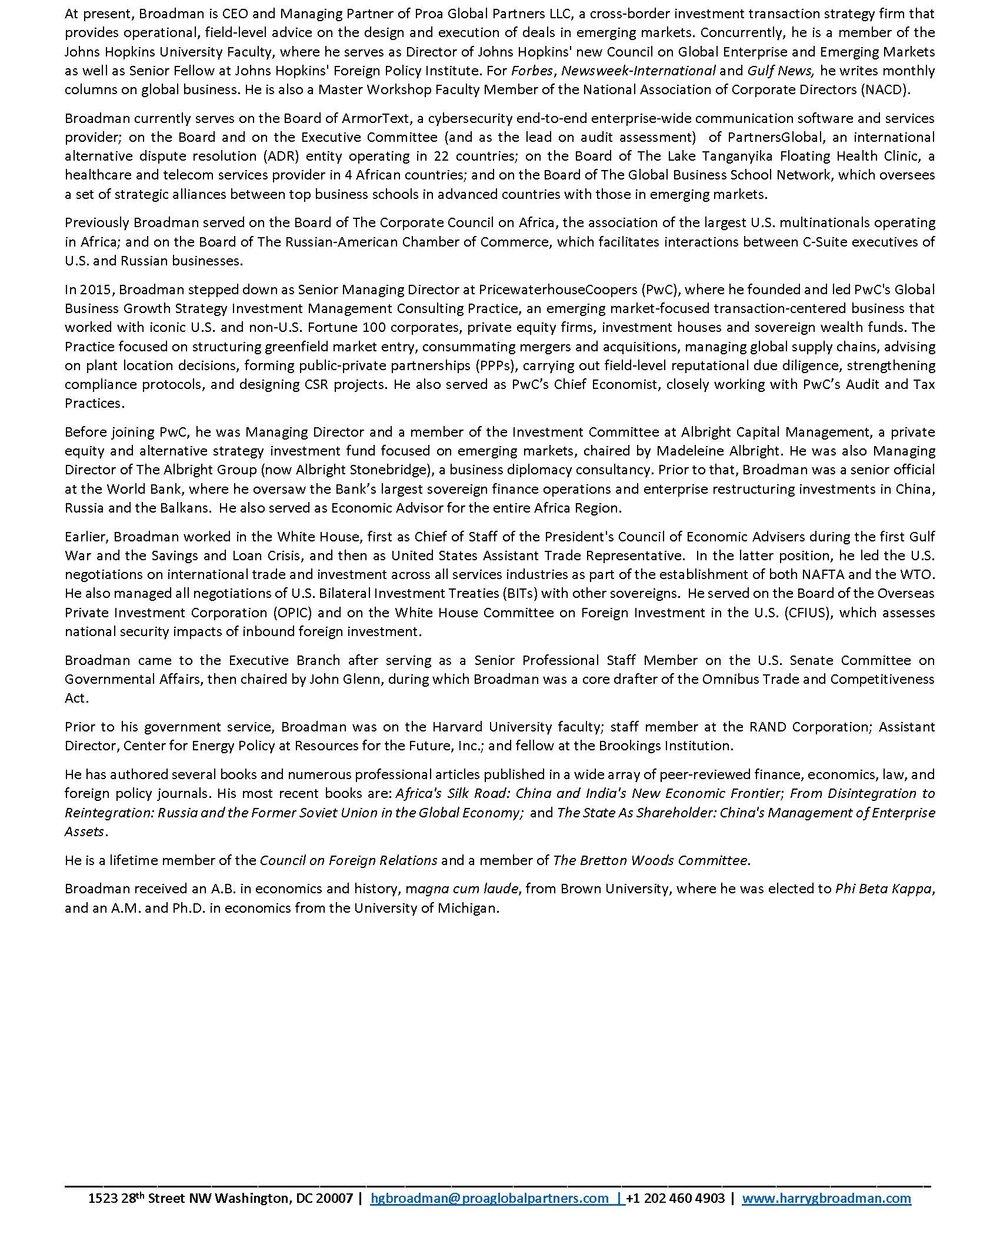 Harry Broadman Detailed Executive BIO 2-20-18_Page_2.jpg